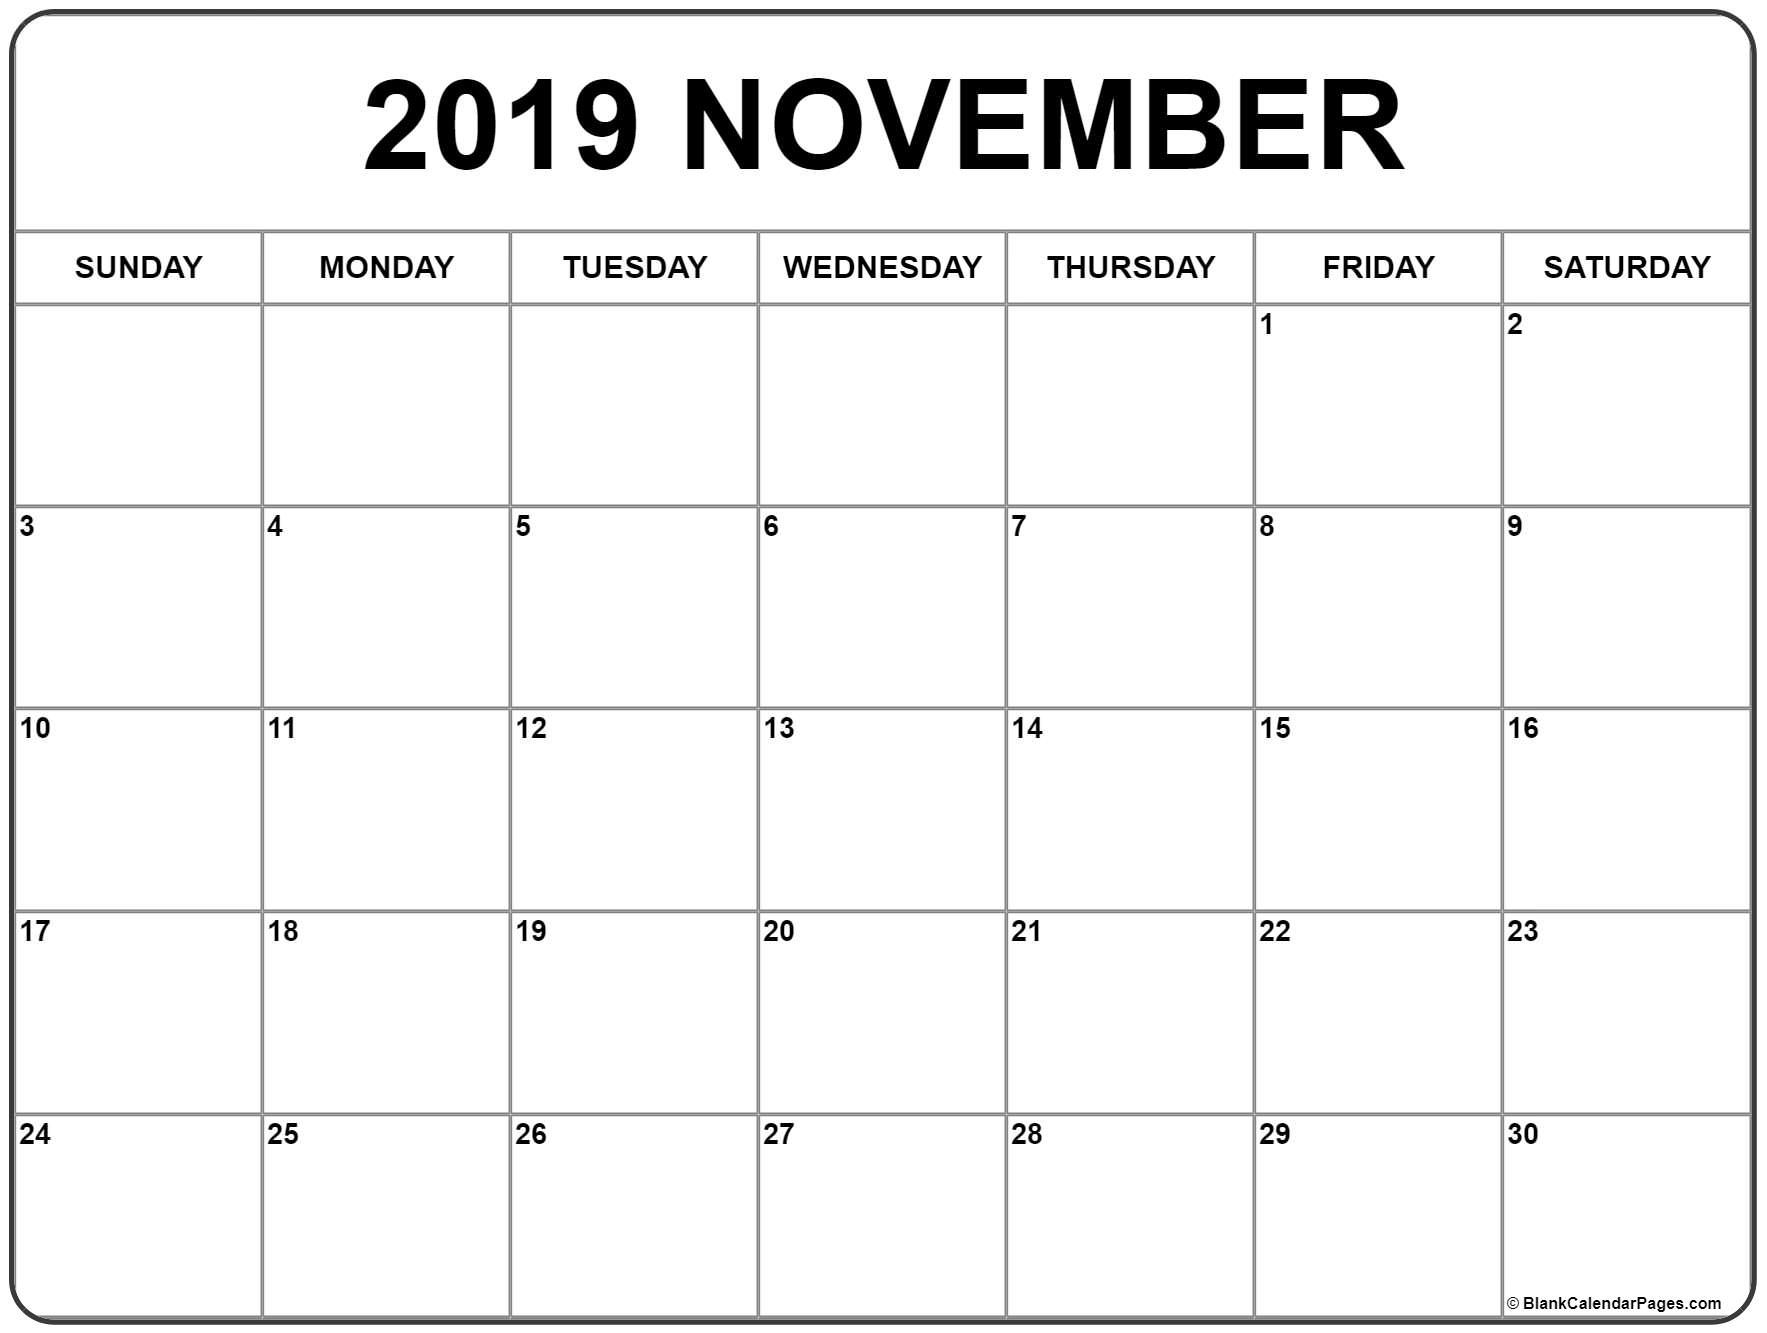 November 2019 Calendar | Monthly Calendar Printable